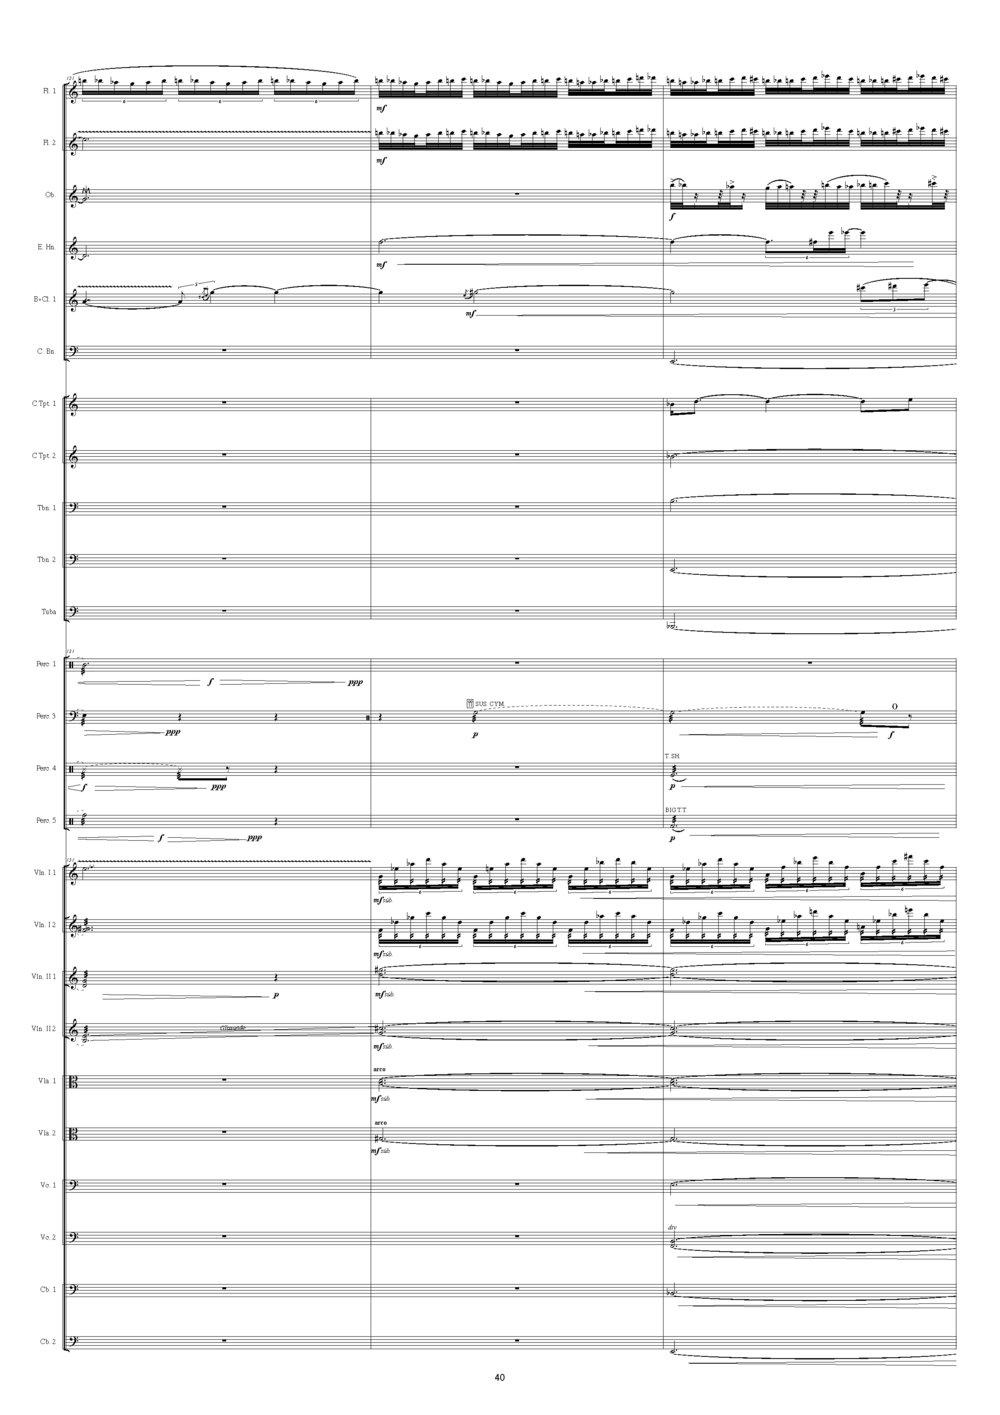 METANOIA_2009-RAPPOPORT_Seite_40.jpg